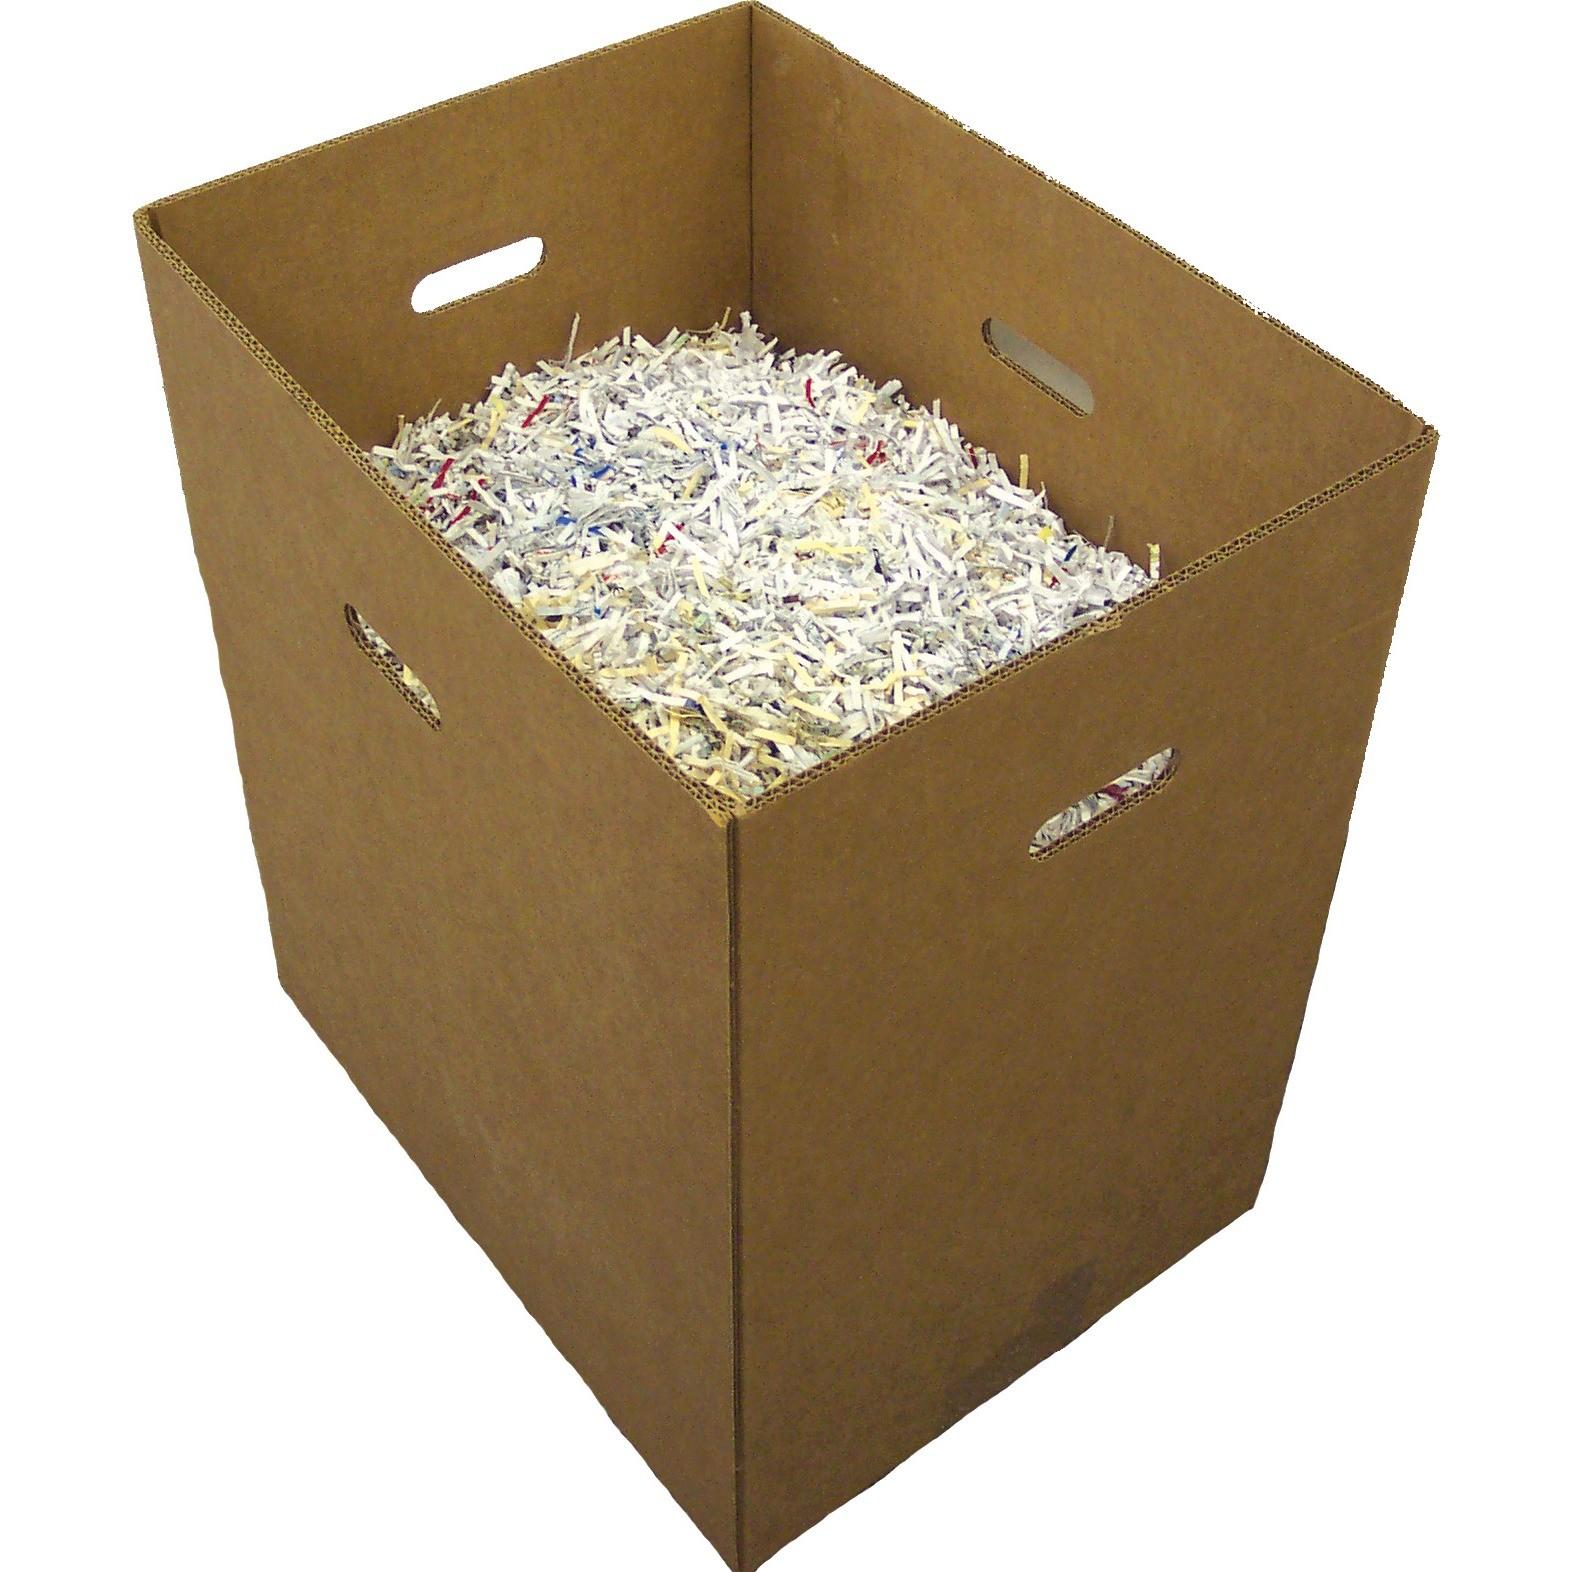 HSM Shredder Box Insert - fits Classic 40VL Series Balers